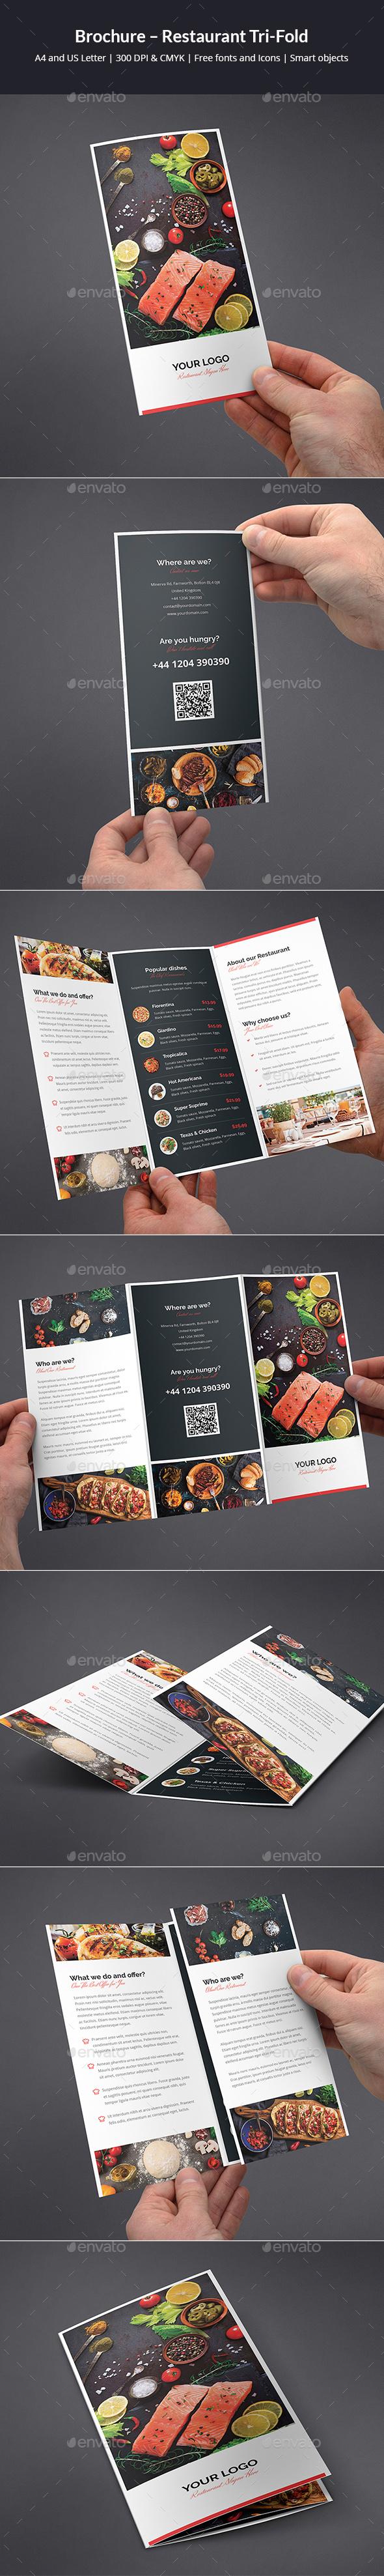 Brochure – Restaurant Tri-Fold - Informational Brochures